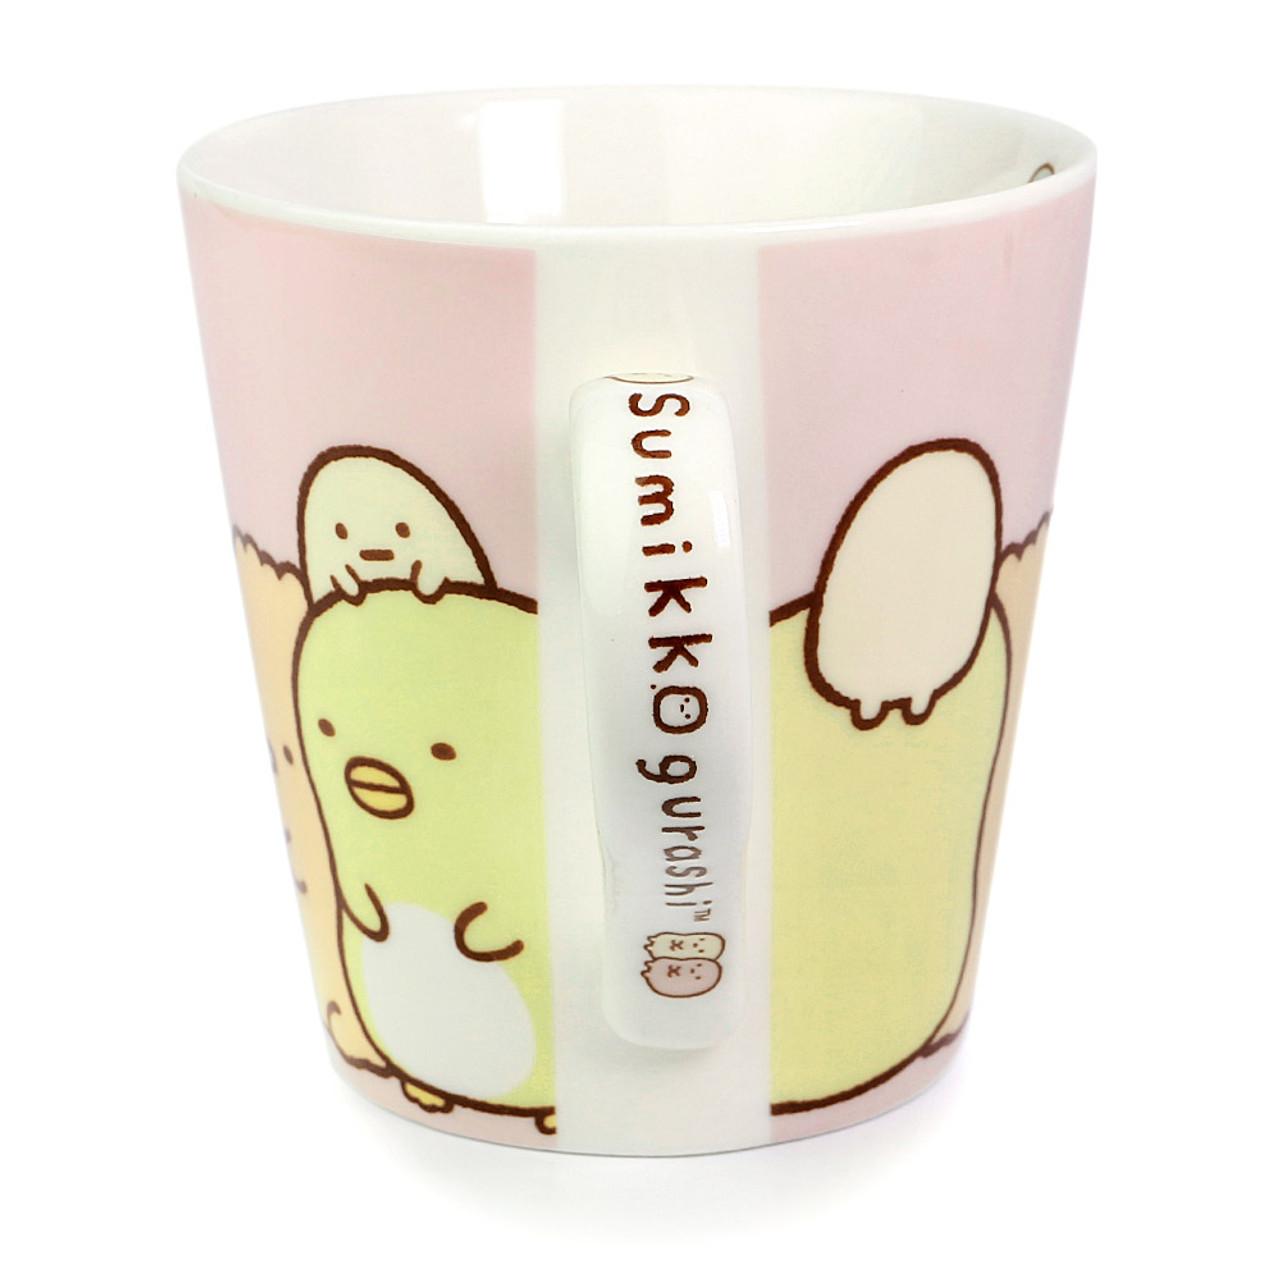 Sumikko Gurashi Measure Ceramic Mug - Horizontal ( Side View )